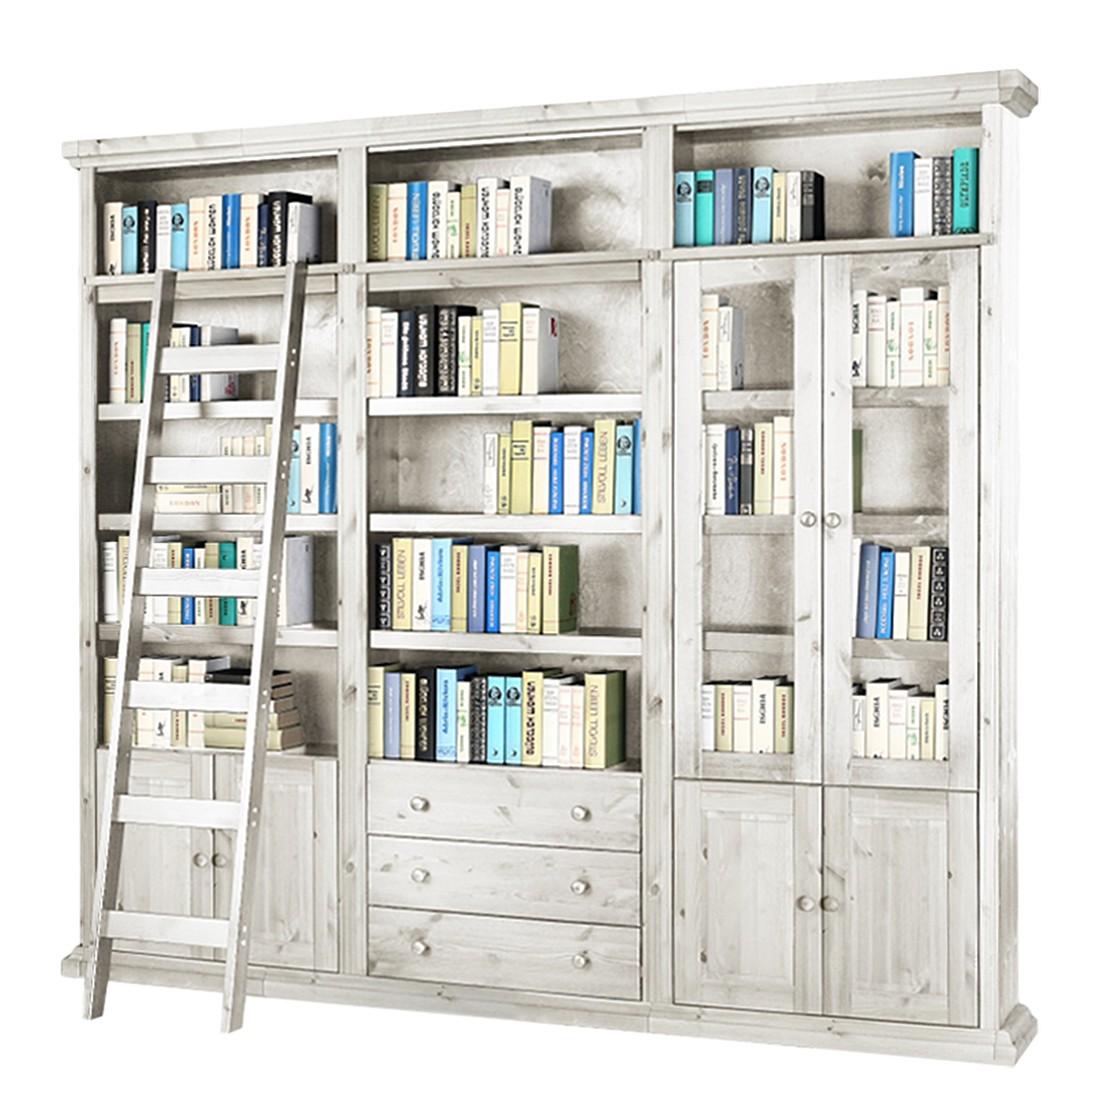 Bücherregal Kelm 2 – Weiß lackiert, Lars Larson bestellen